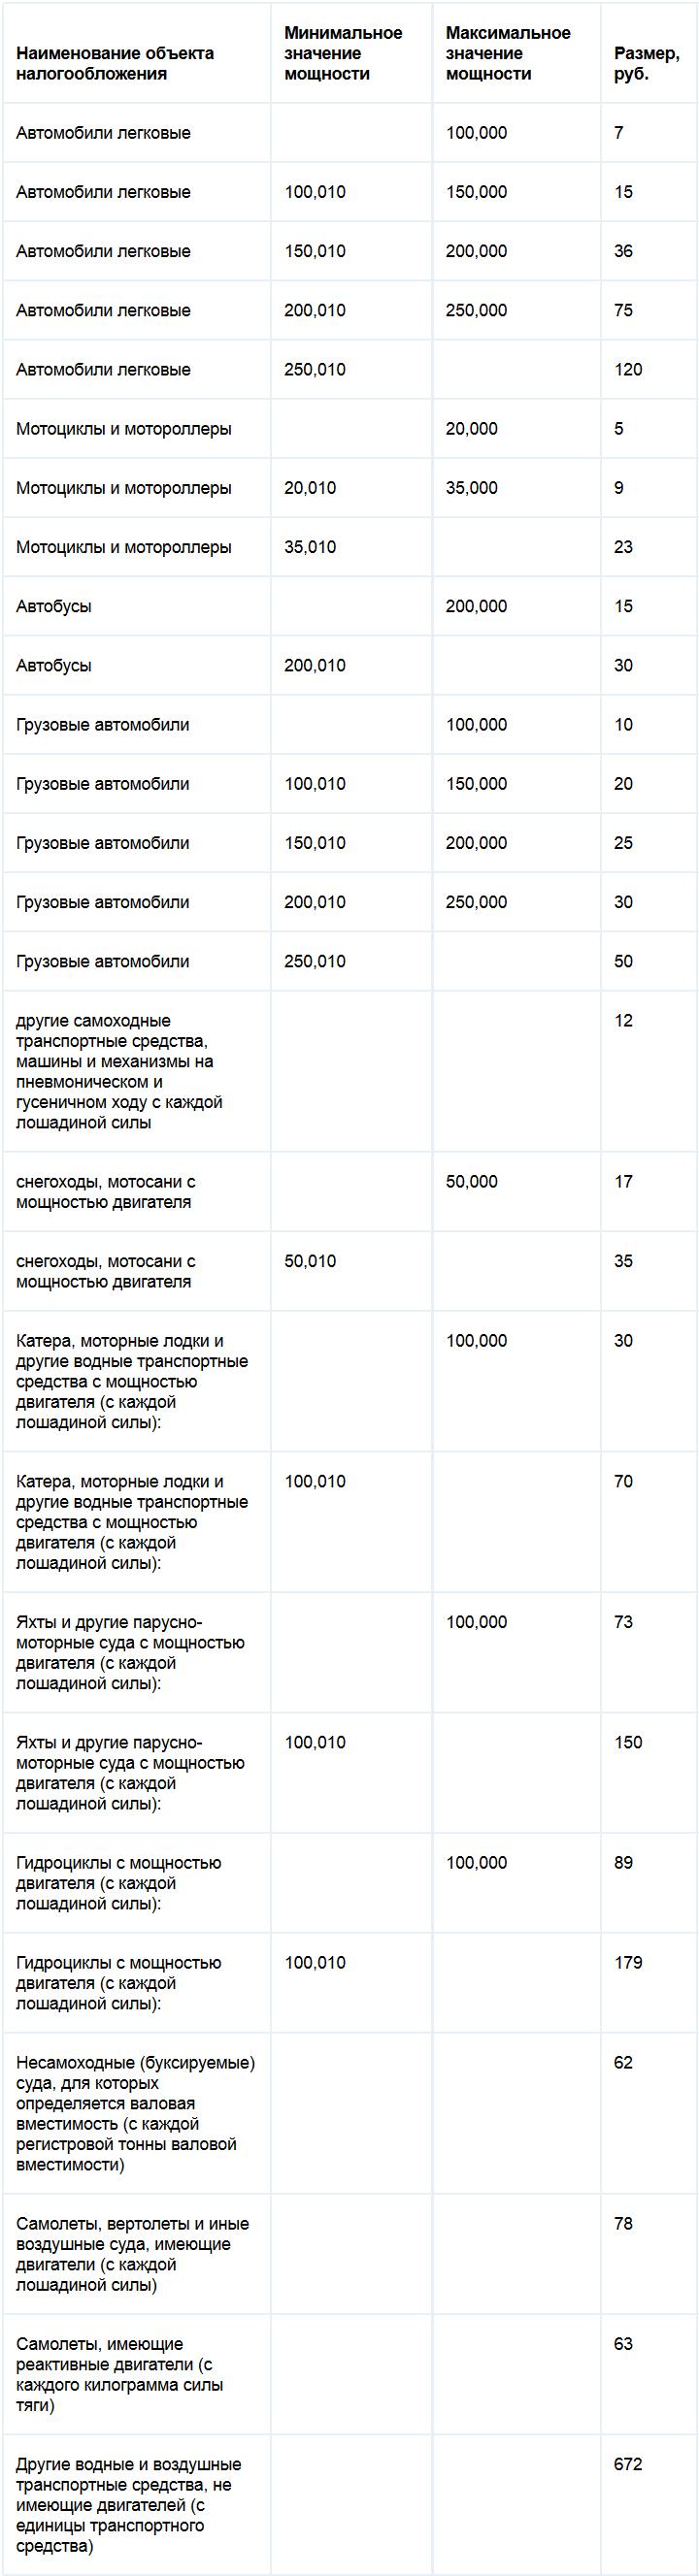 Ставки транспортного налога Ставропольского края